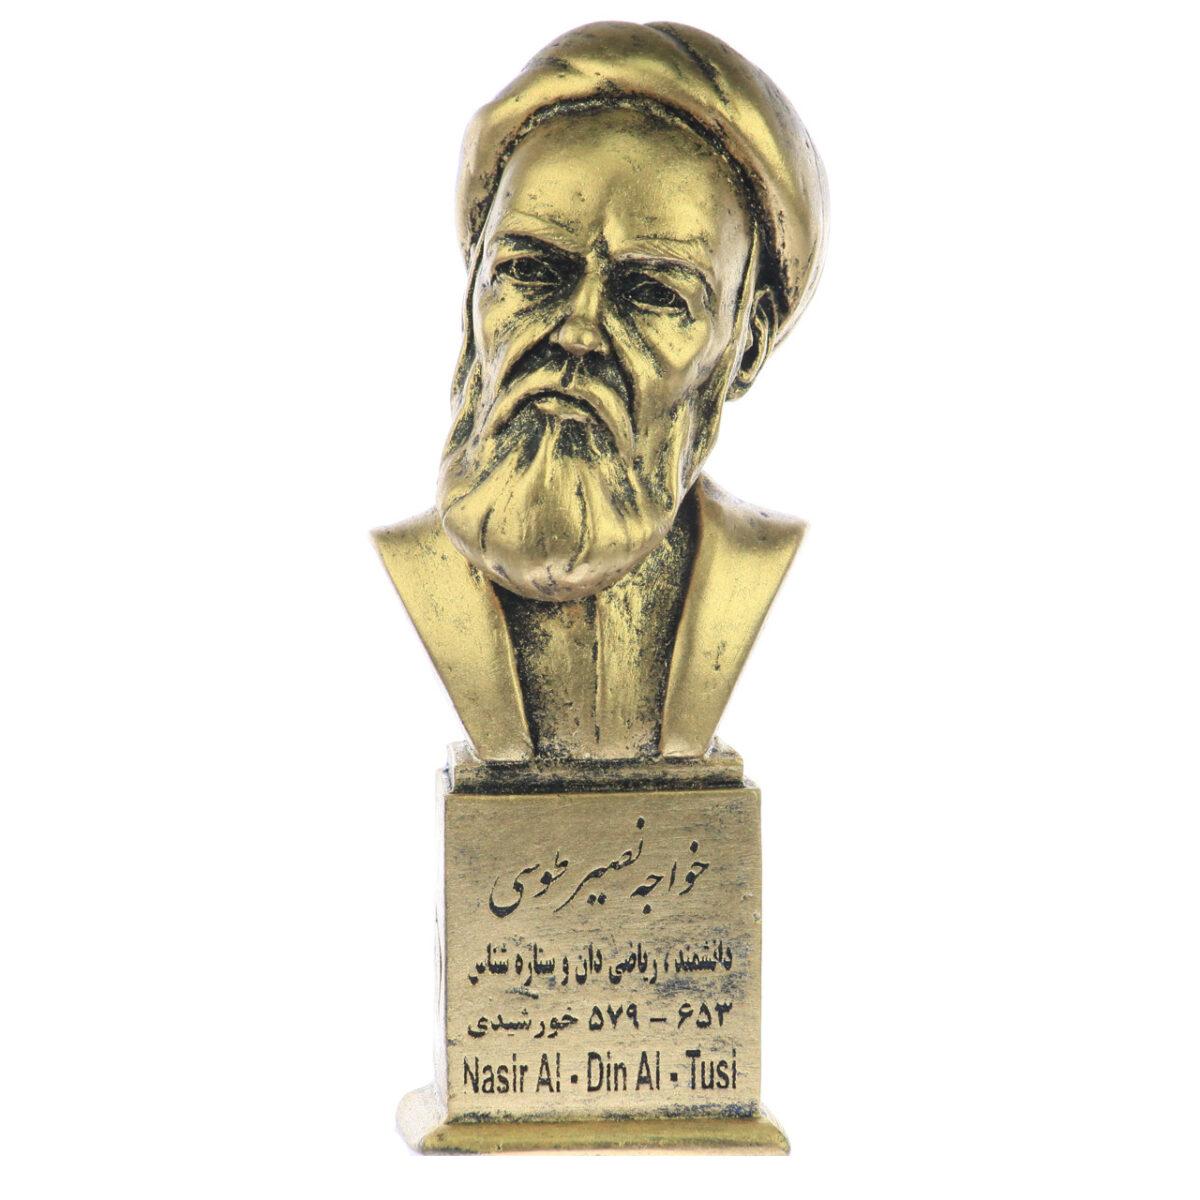 khaje toosi b 1200x1200 - سردیس خواجه نصیرالدین طوسی